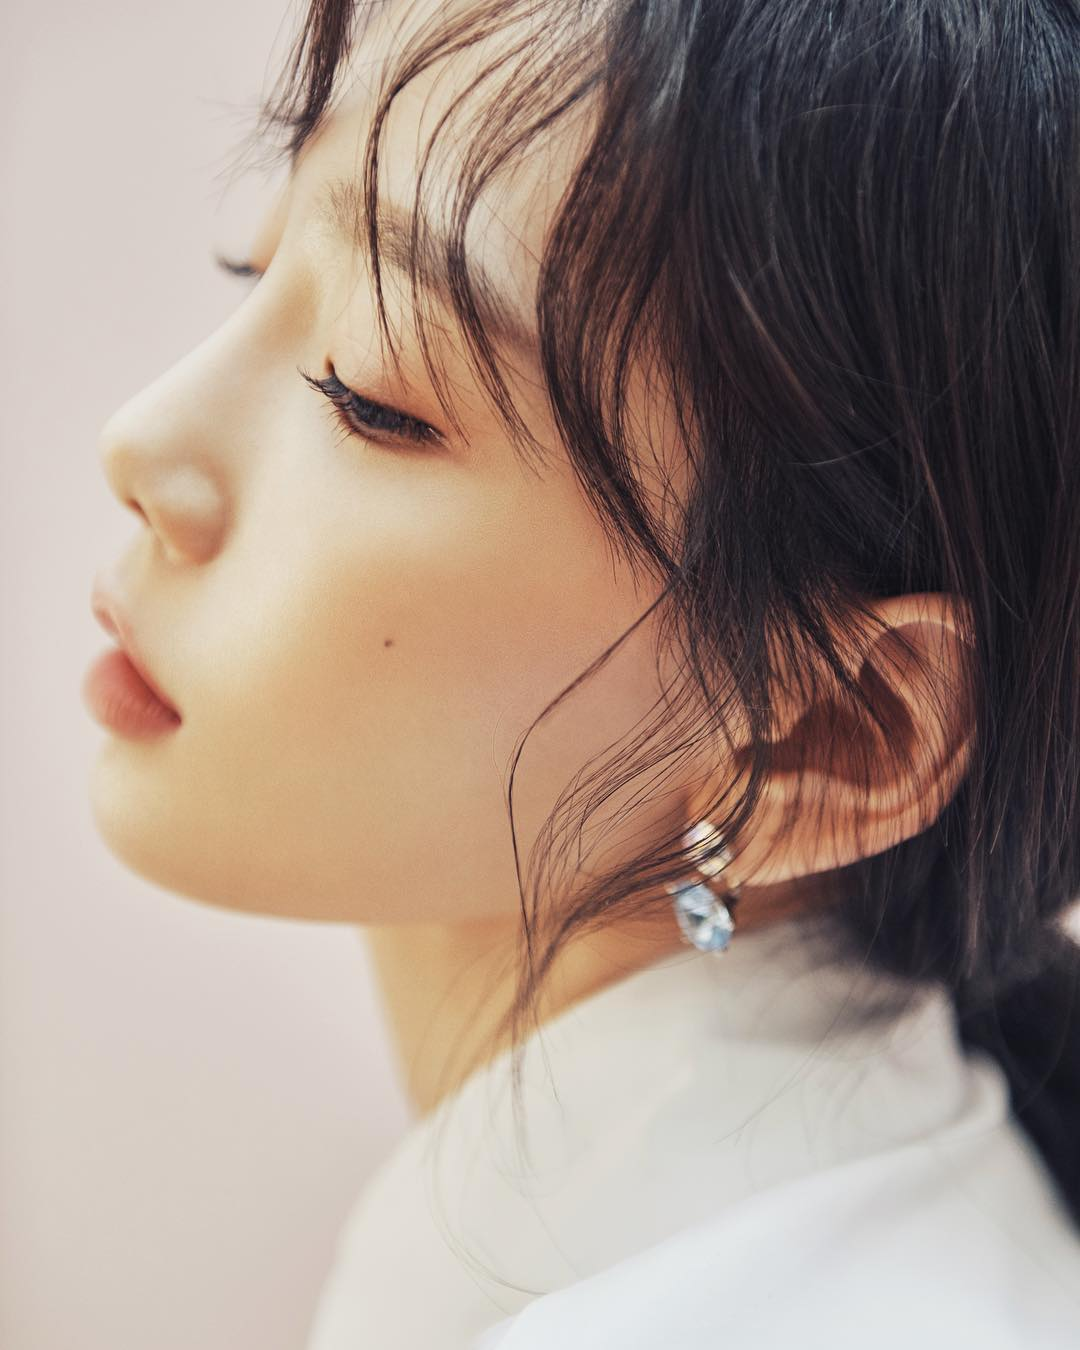 Kim Tae-yeon Instagram username